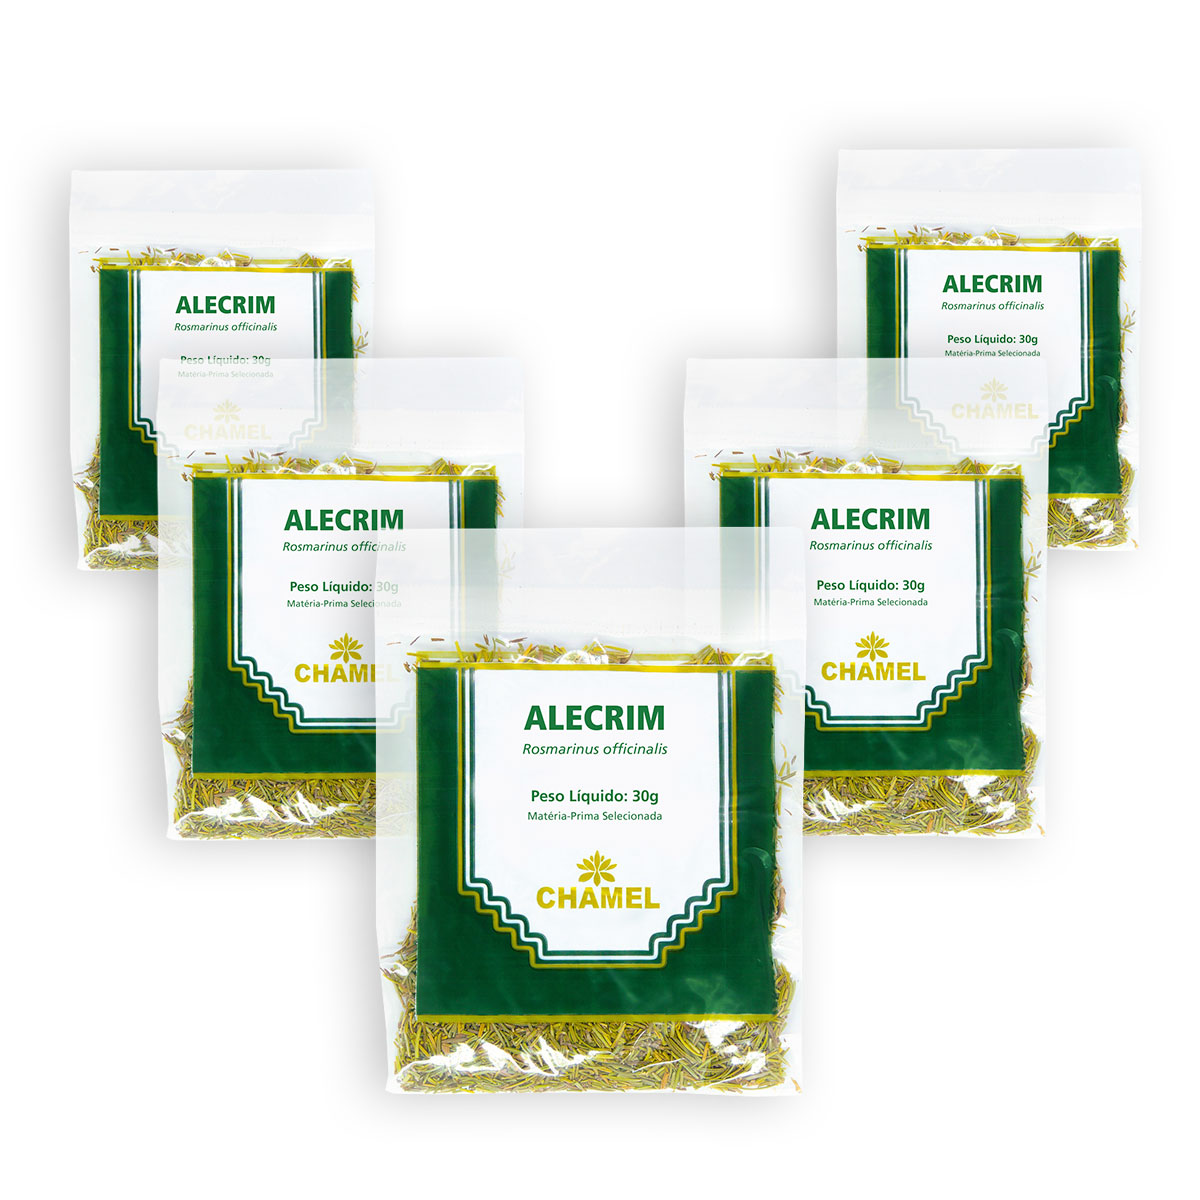 Kit Alecrim 30g Chamel - Chá-Folhas